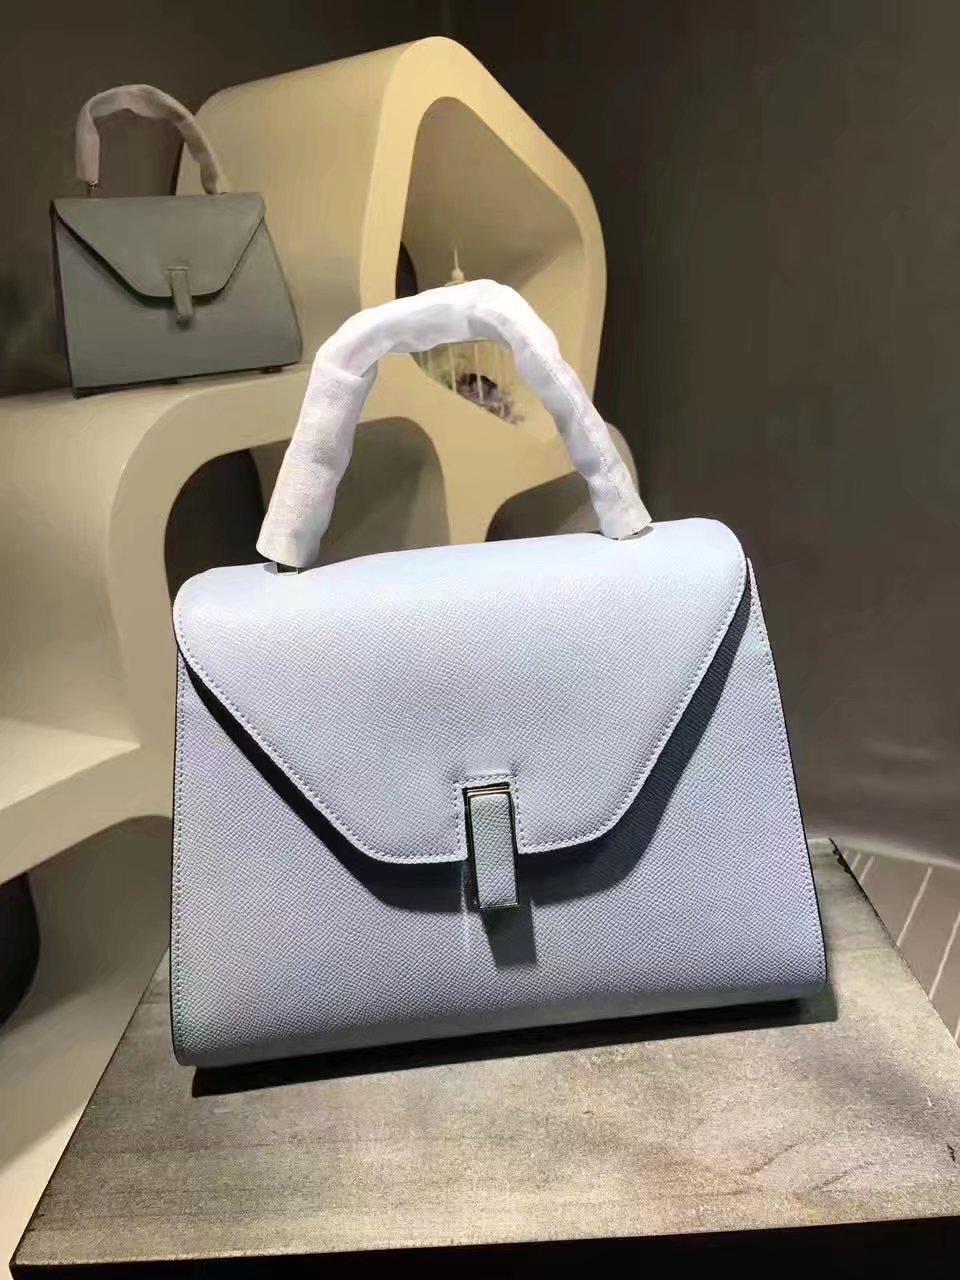 Valextra Superbag Iside Bag Smokey Blue